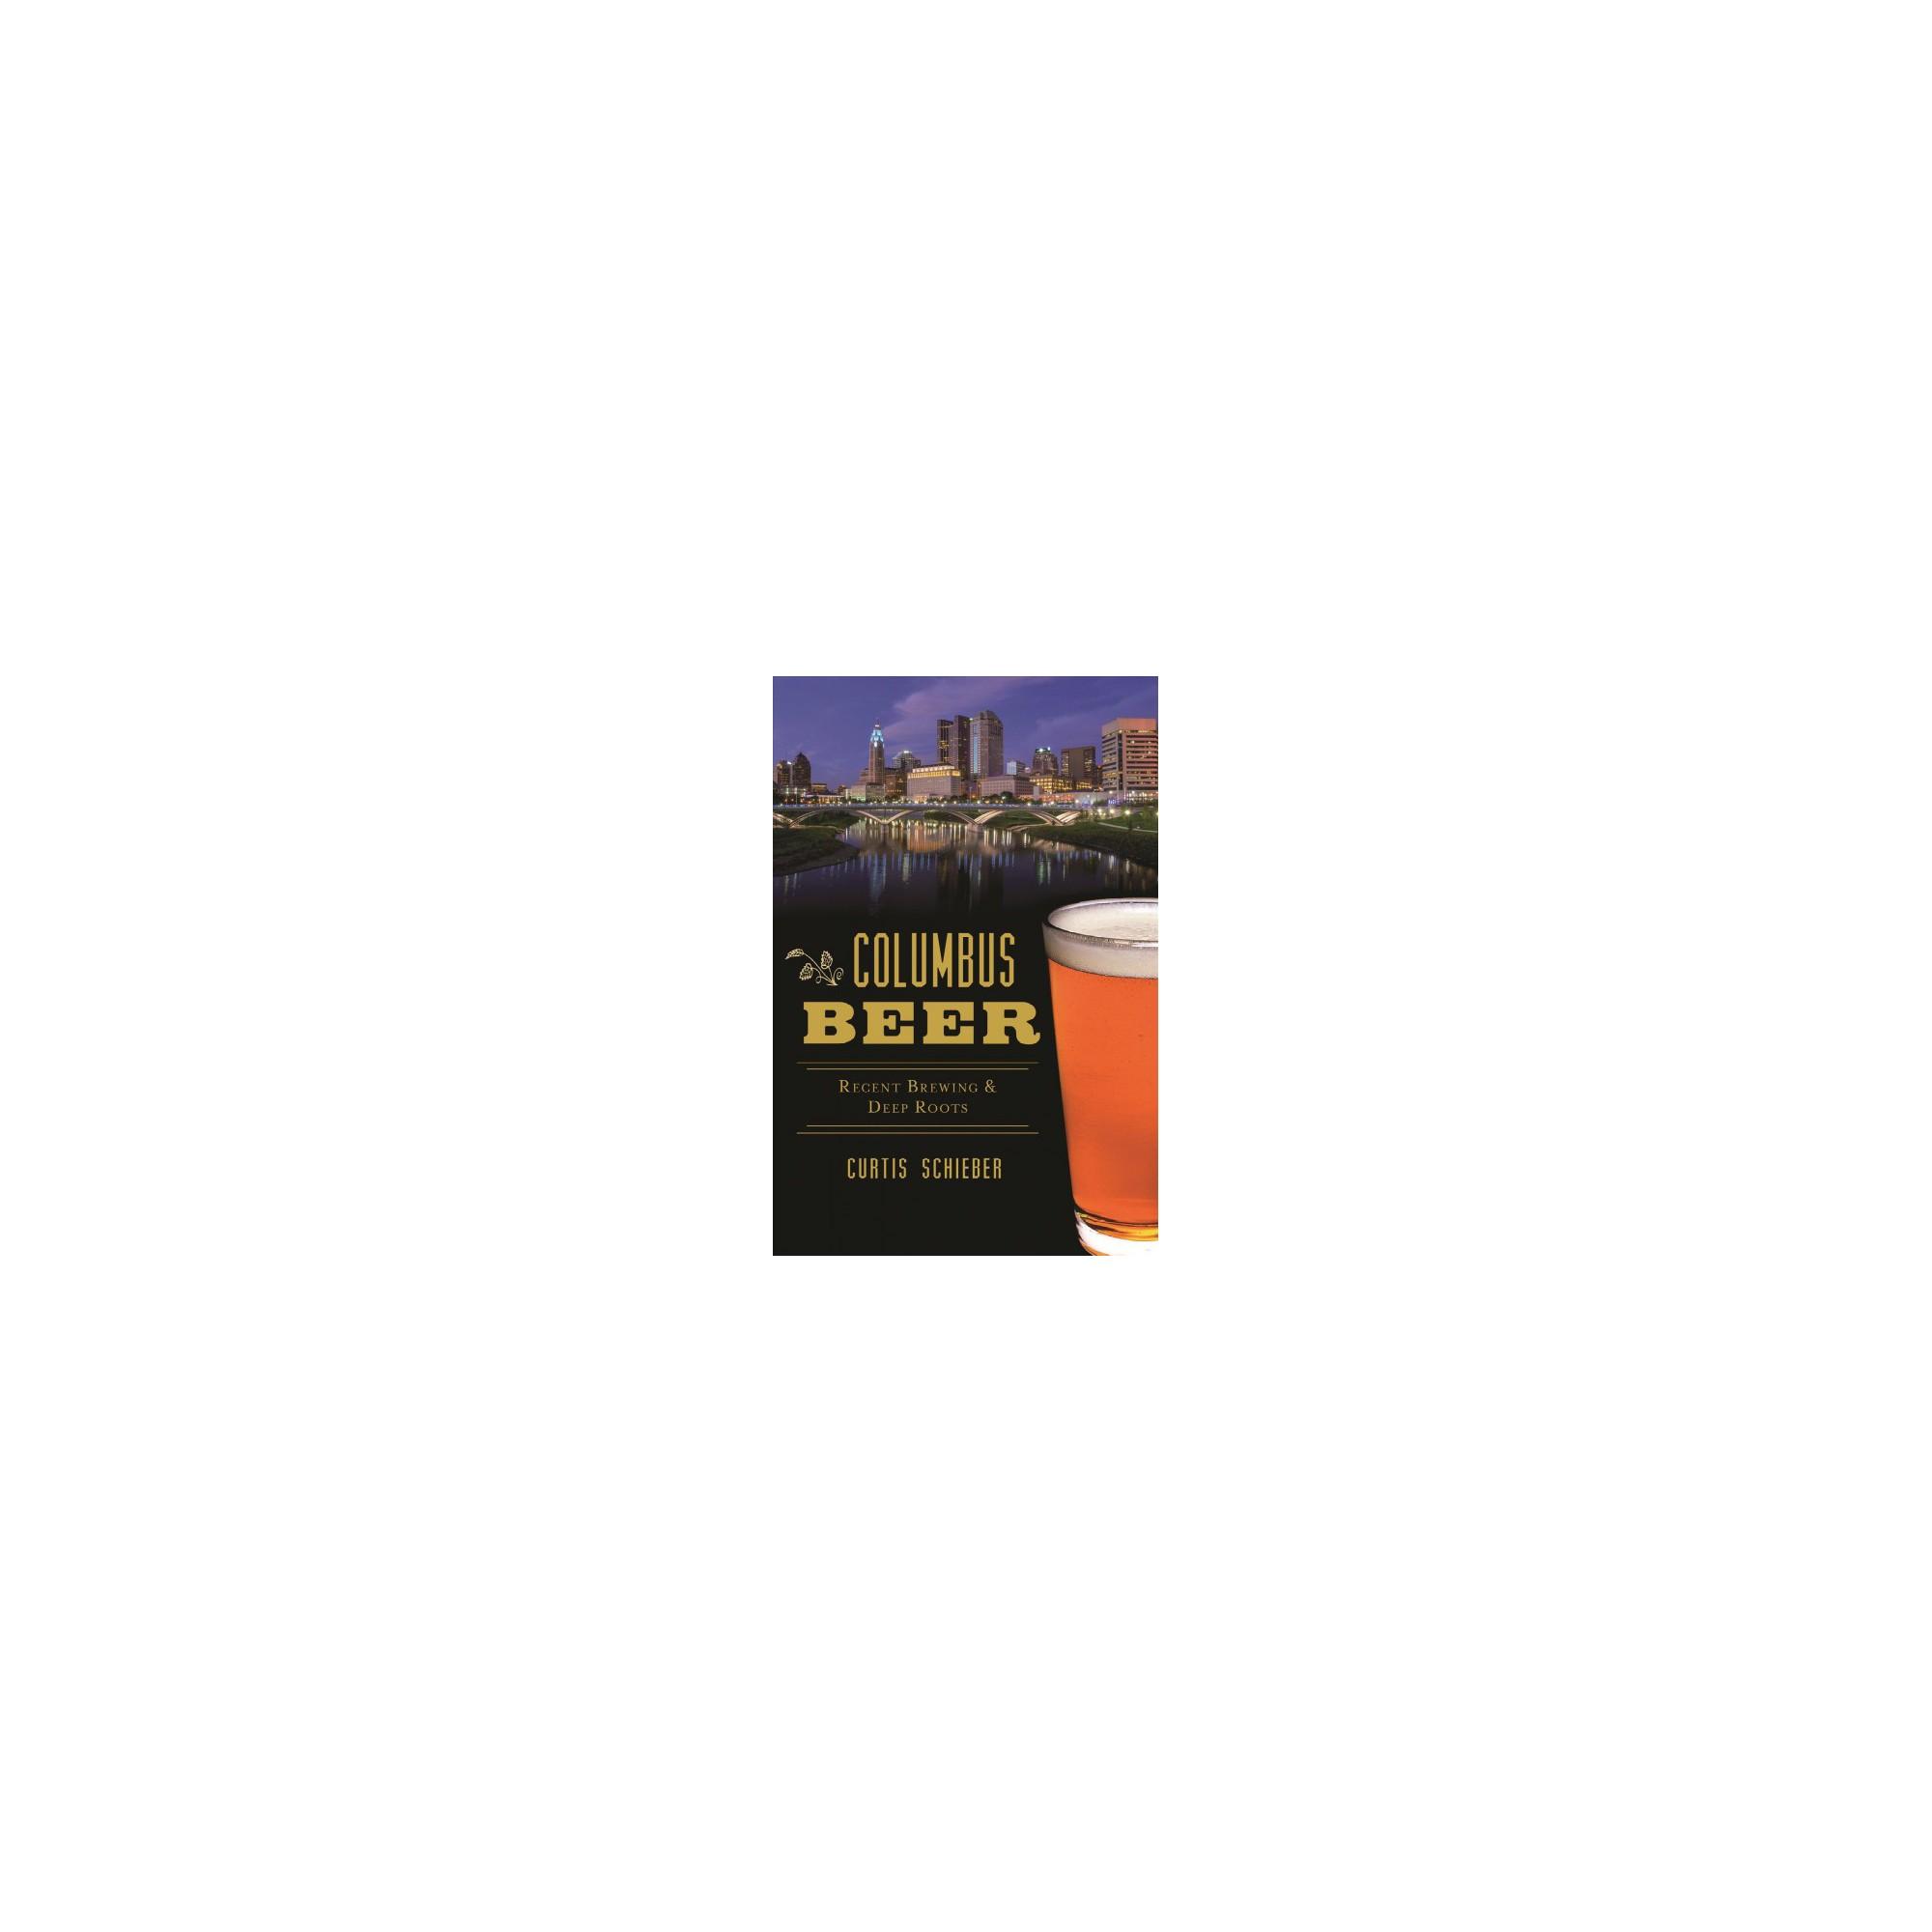 Küchenideen ziegel columbus beer  recent brewing and deep roots paperback curtis